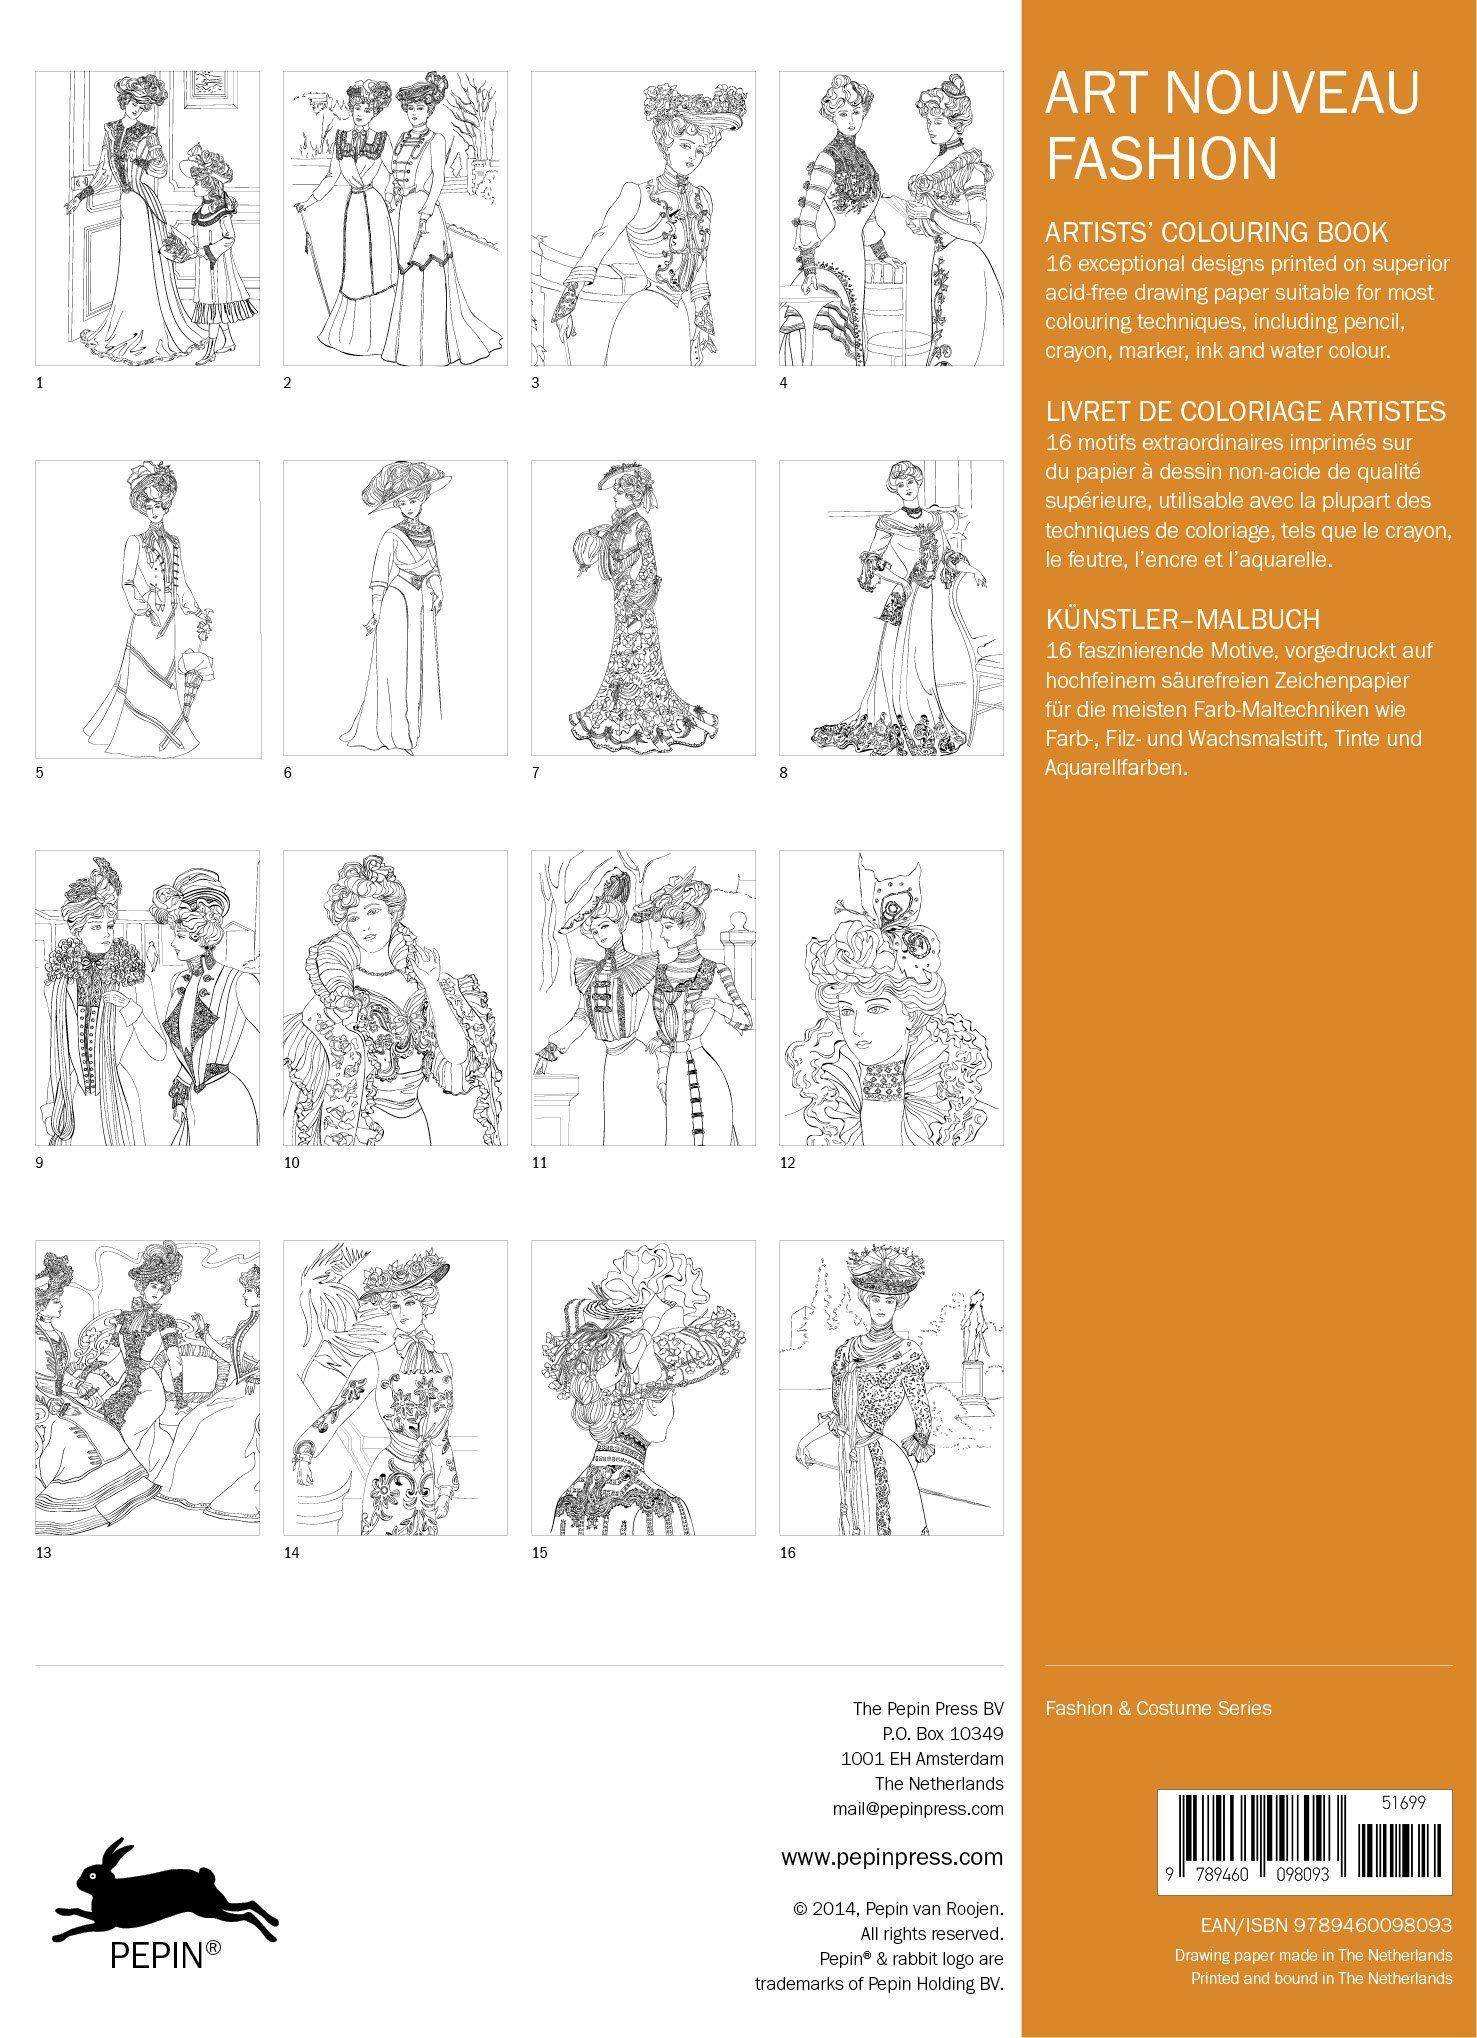 Colour book art - Artists Colouring Book Art Nouveau Fashion 9789460098093 Amazon Com Books